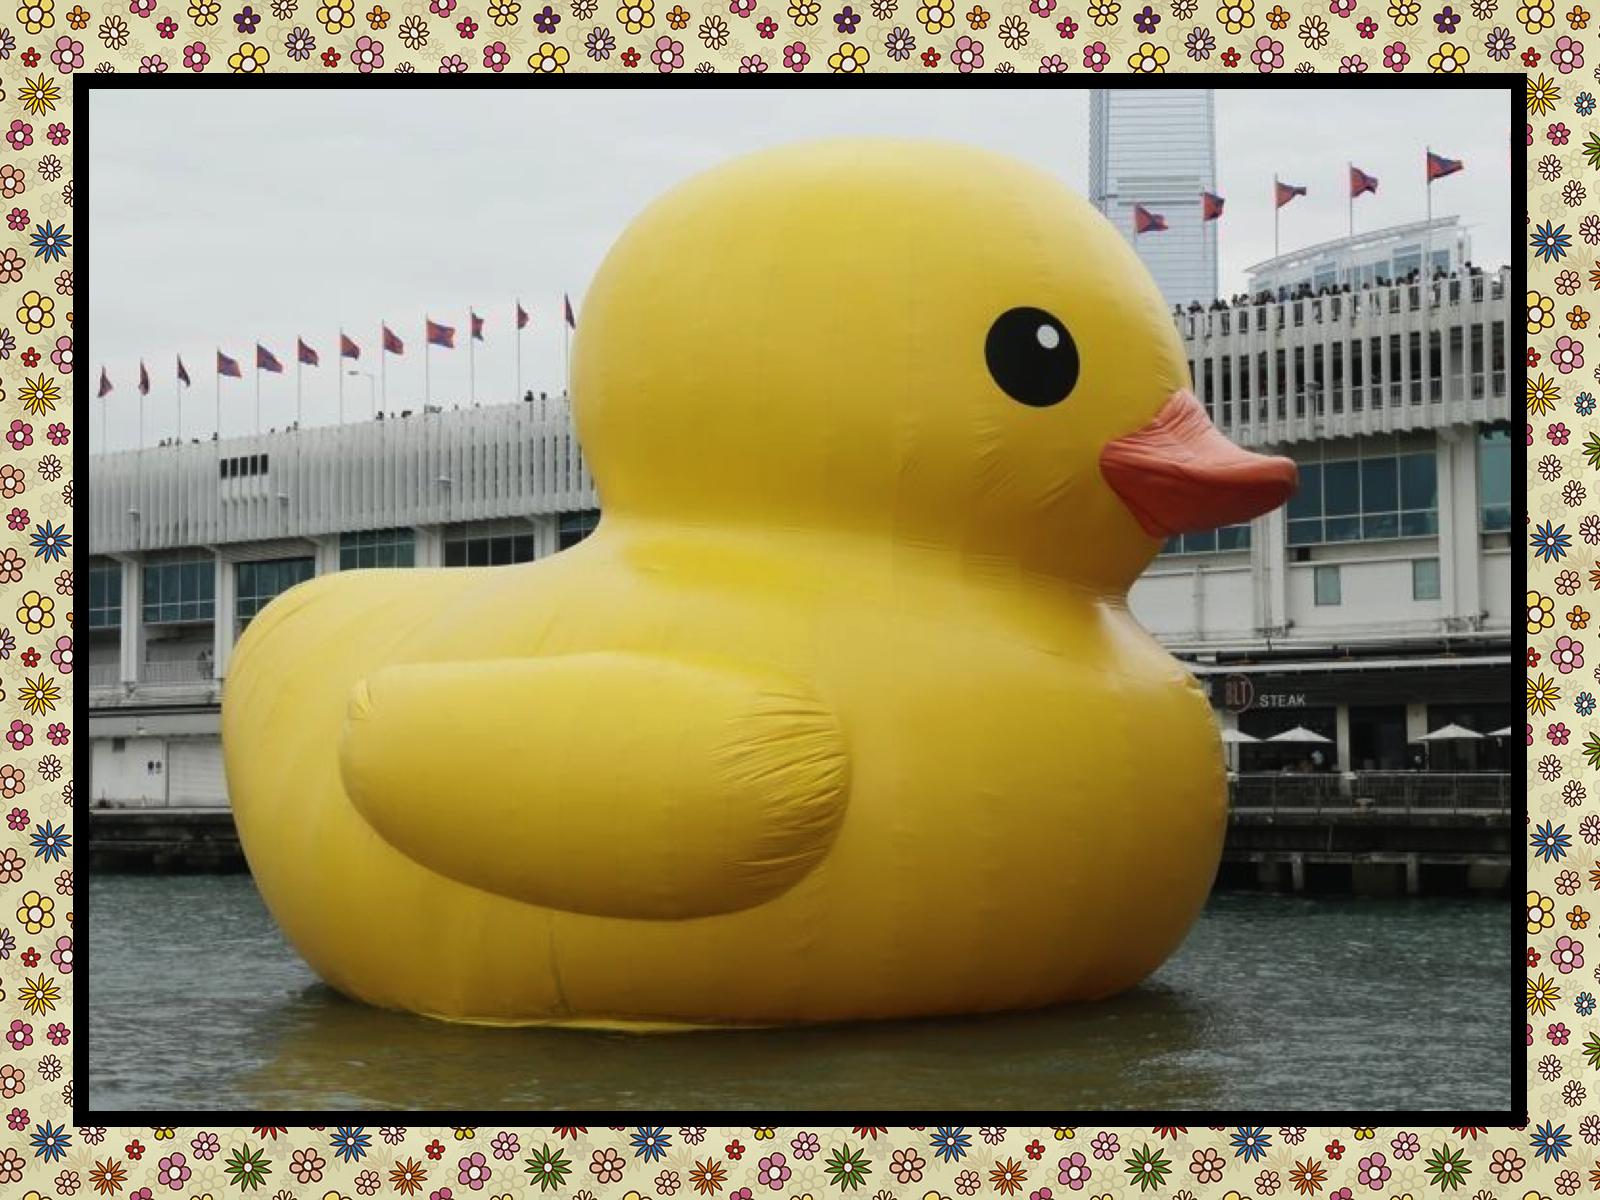 Giant Rubber Duck Wallpaper Giant rubber duck 1600x1200